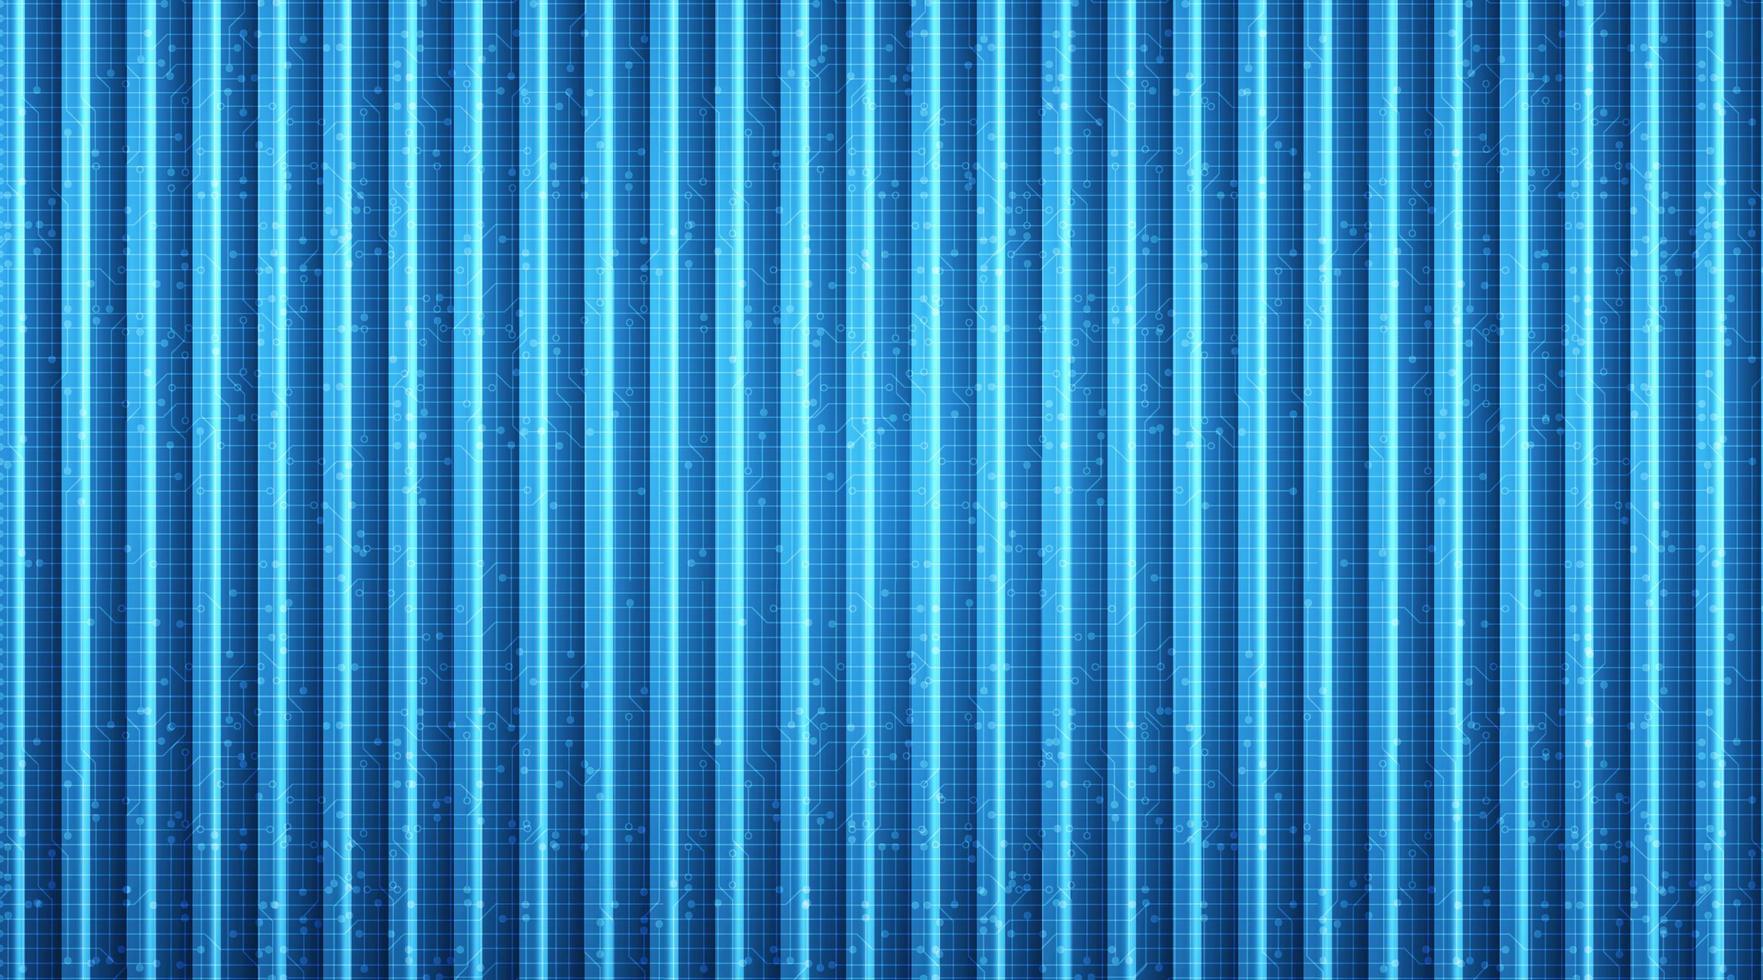 Neon Line Technology Microchip-bakgrund. vektor